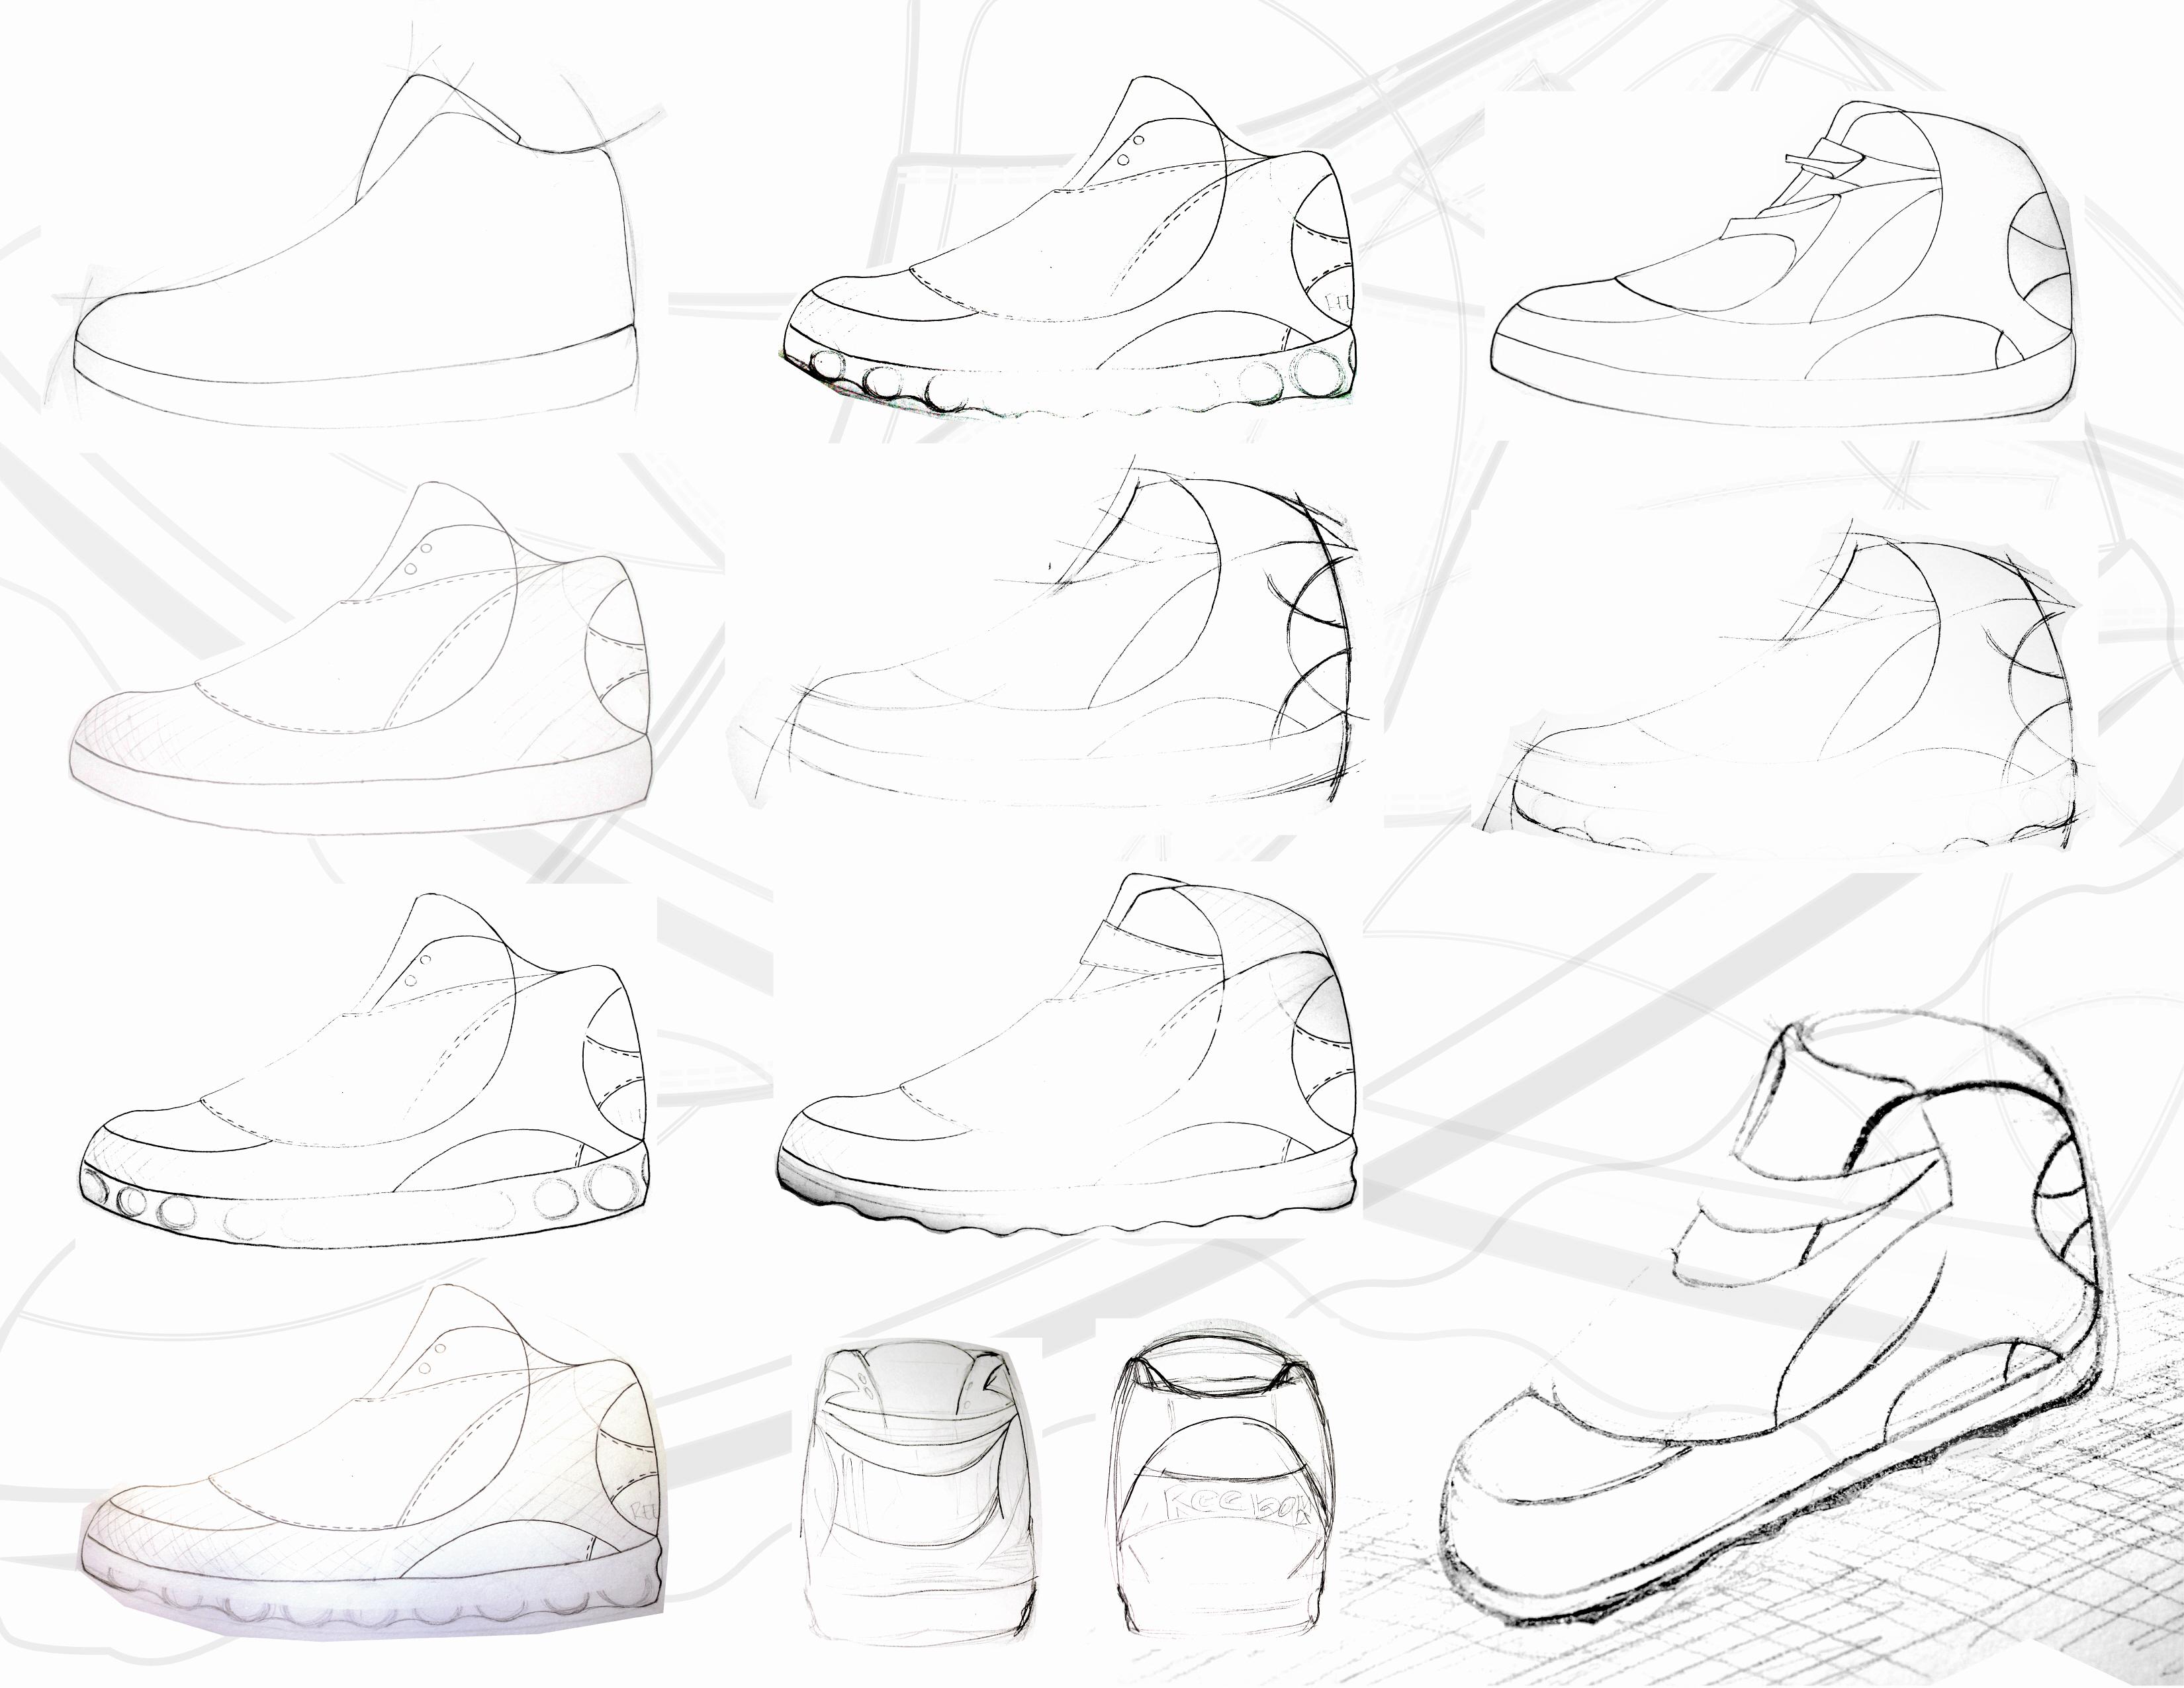 How To Draw Shoes Reebok Basketball Sho Illustrator Based Basketball Shoe  Concept